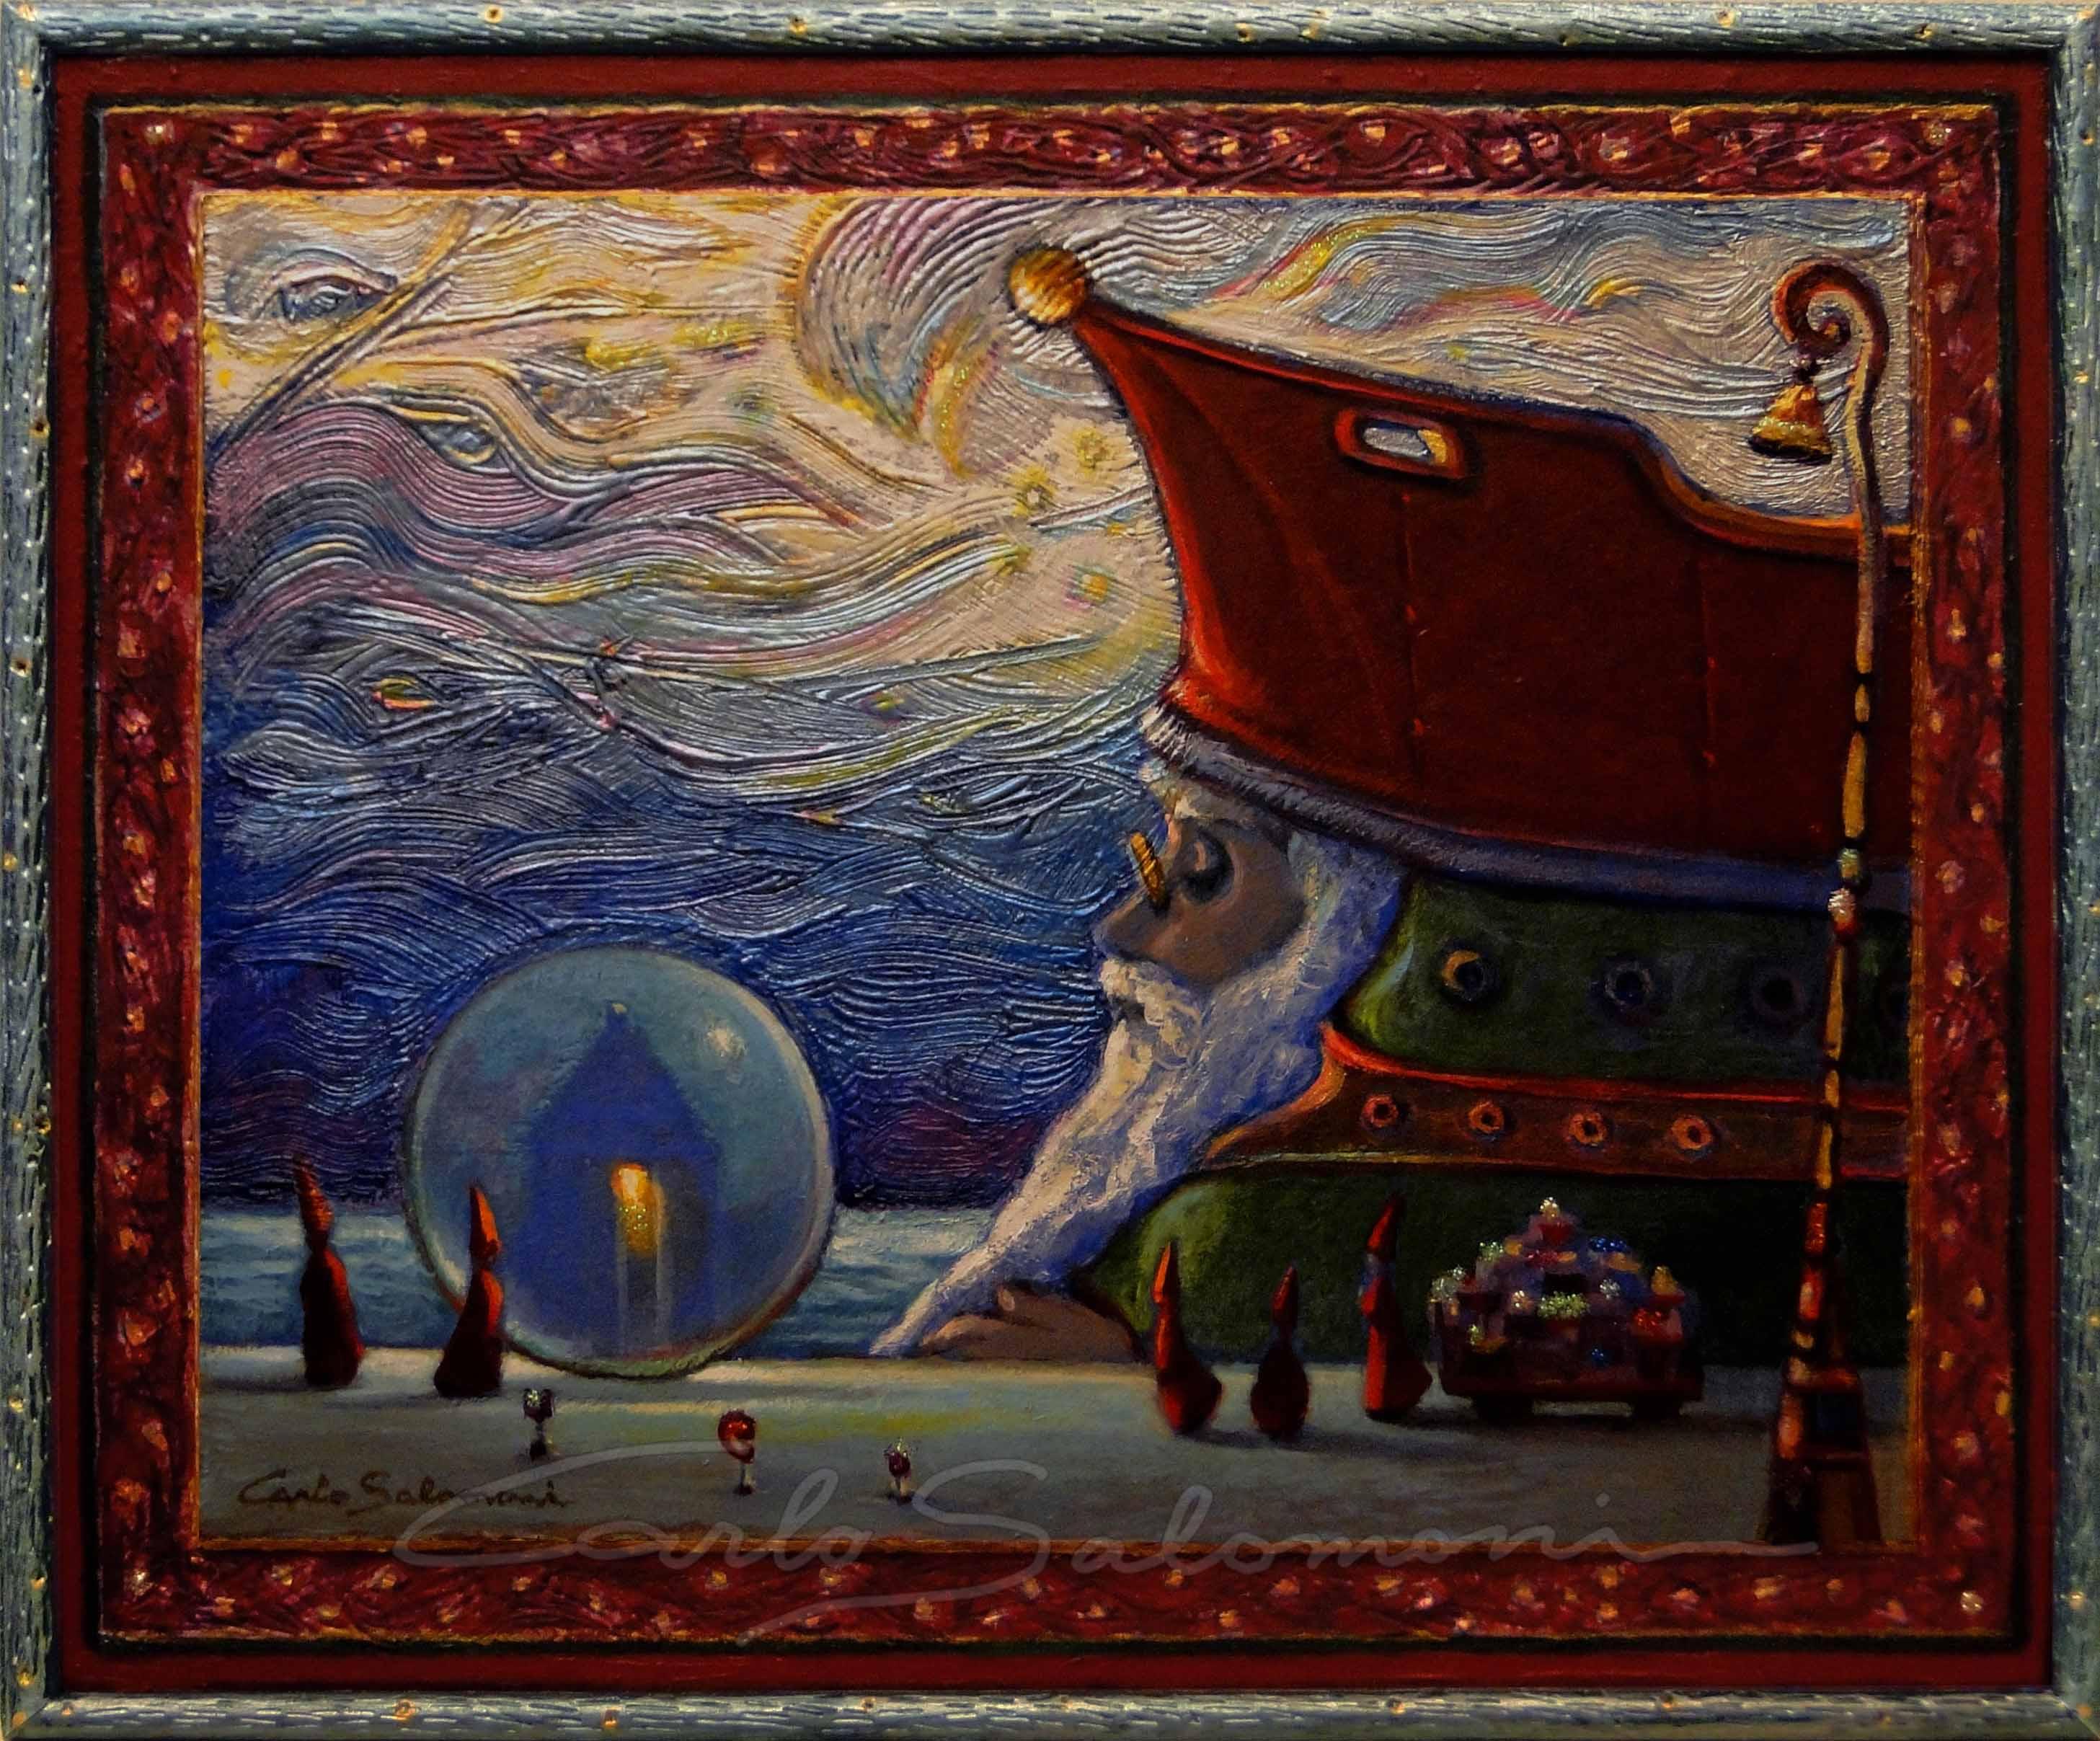 THE SHIP OF CHRISTMAS GIFTS